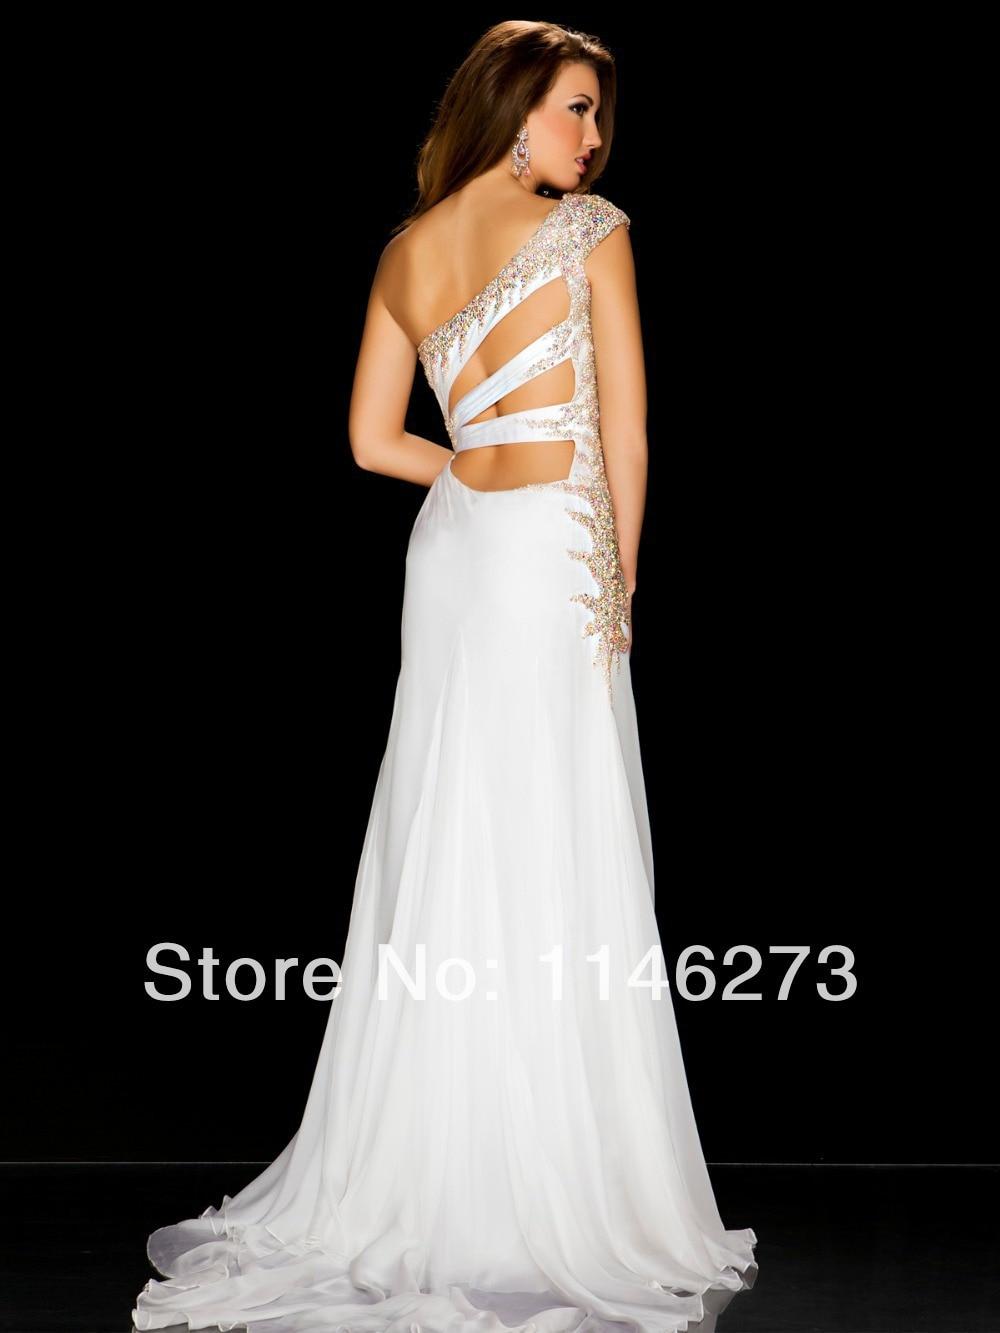 Modern Indie Prom Dresses Ideas - Wedding Dresses & Bridal Gowns ...